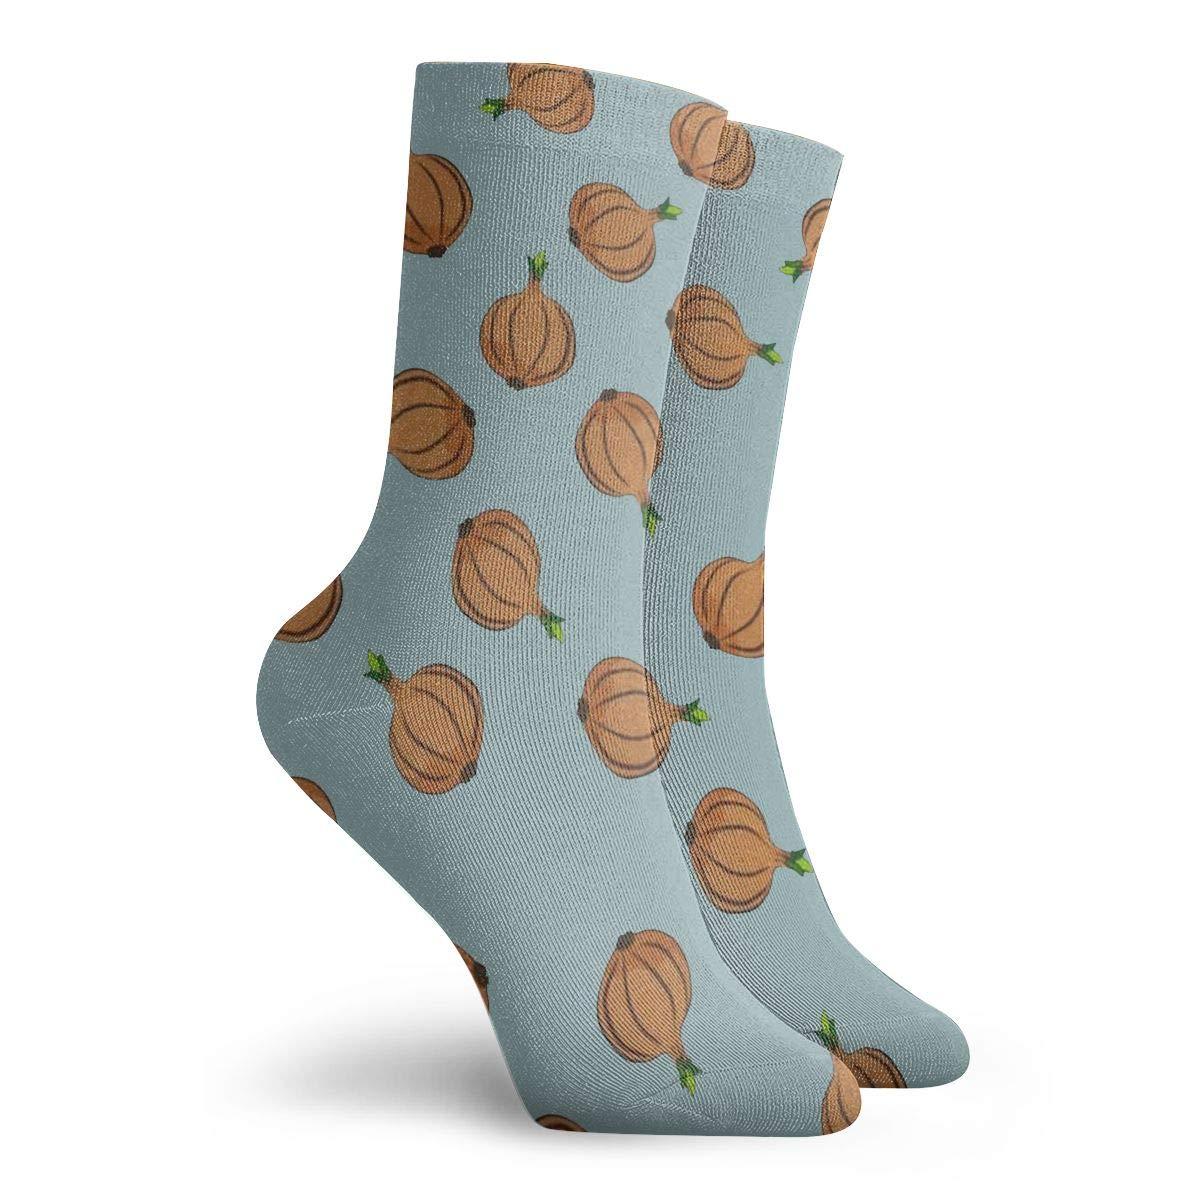 Garlic Unisex Funny Casual Crew Socks Athletic Socks For Boys Girls Kids Teenagers